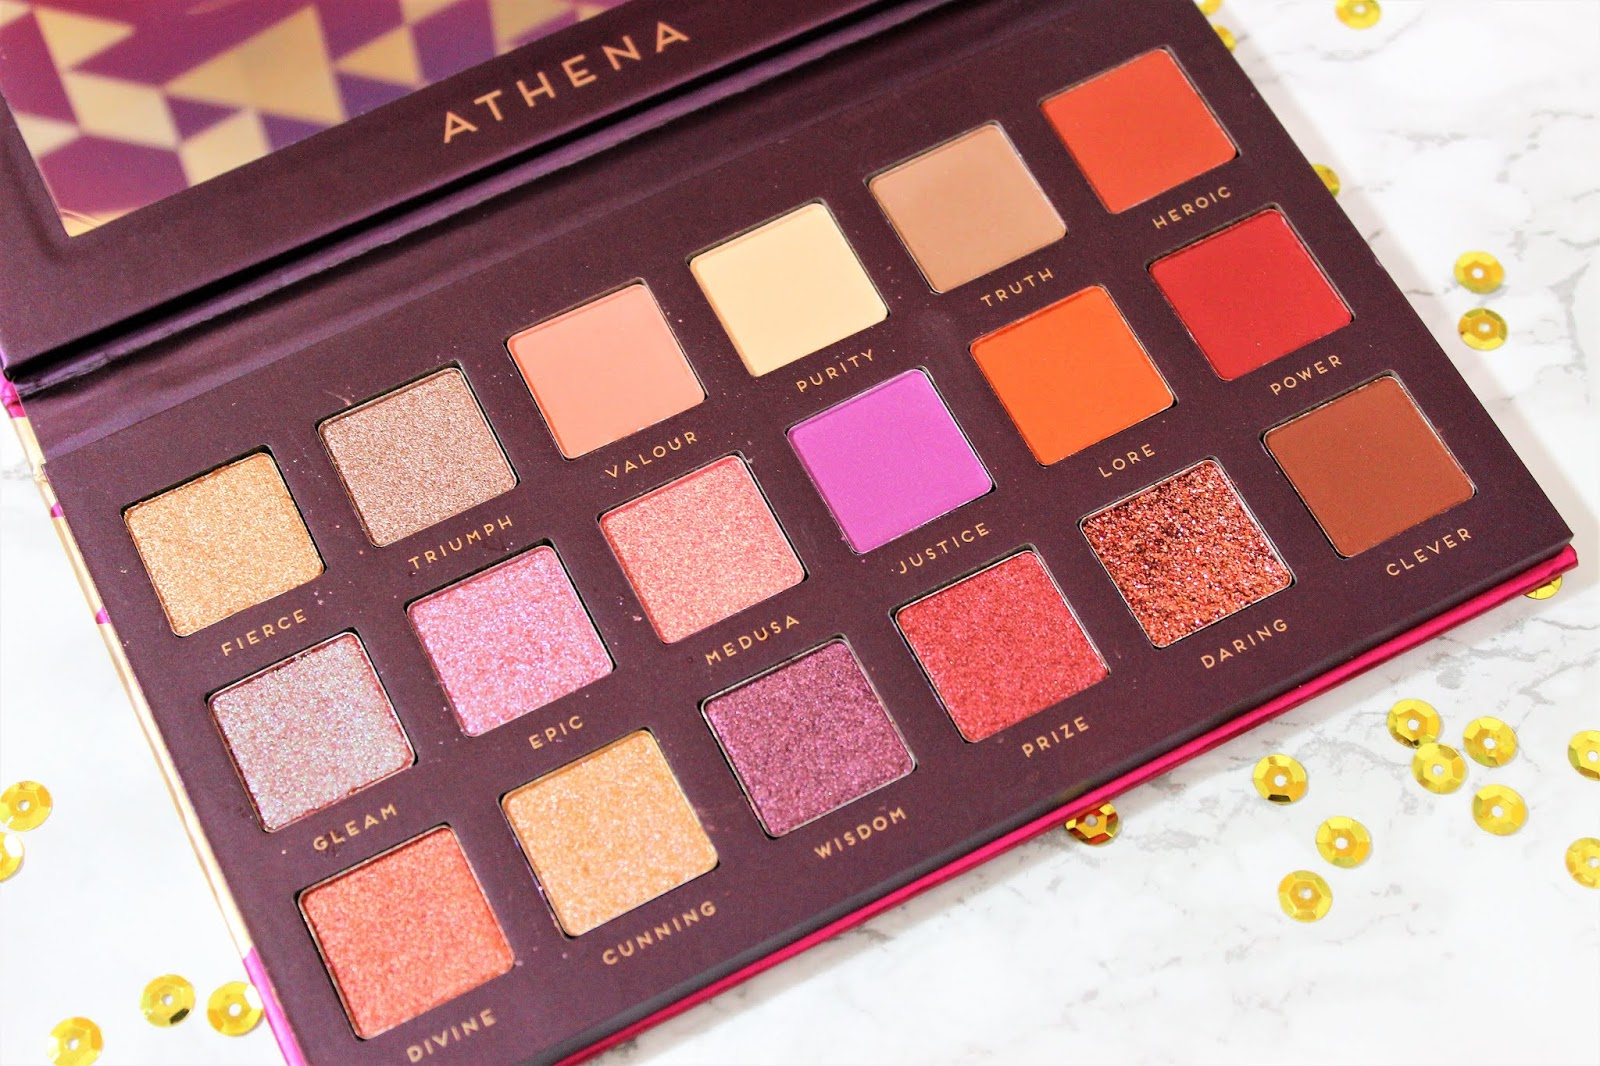 Athena Palette review